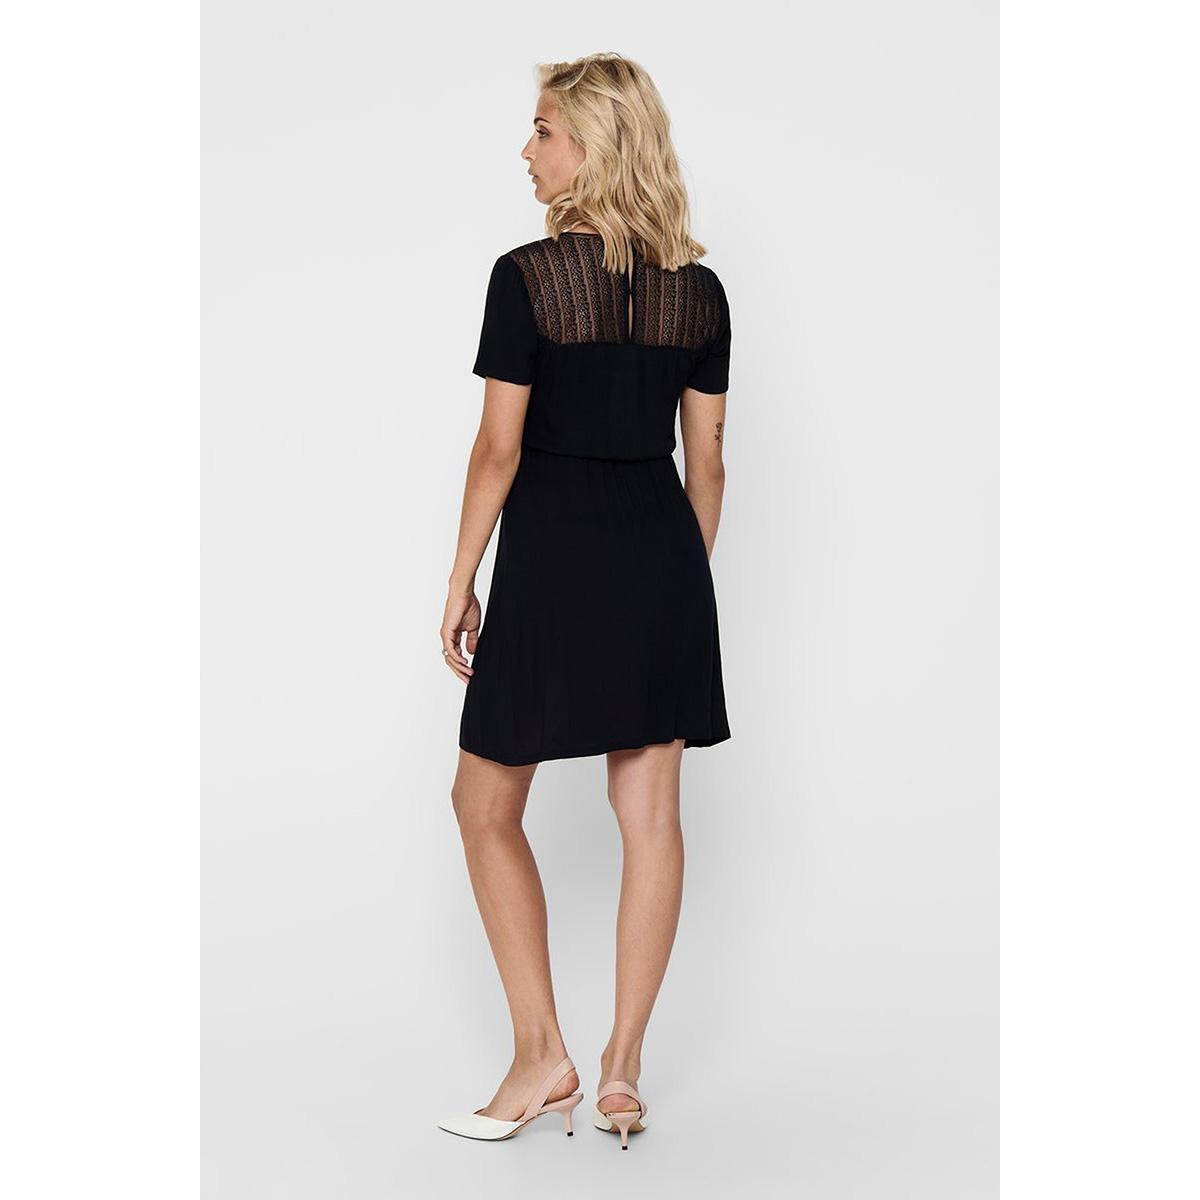 jdysummer s/s lace dress wvn 15194639 jacqueline de yong jurk sky captain